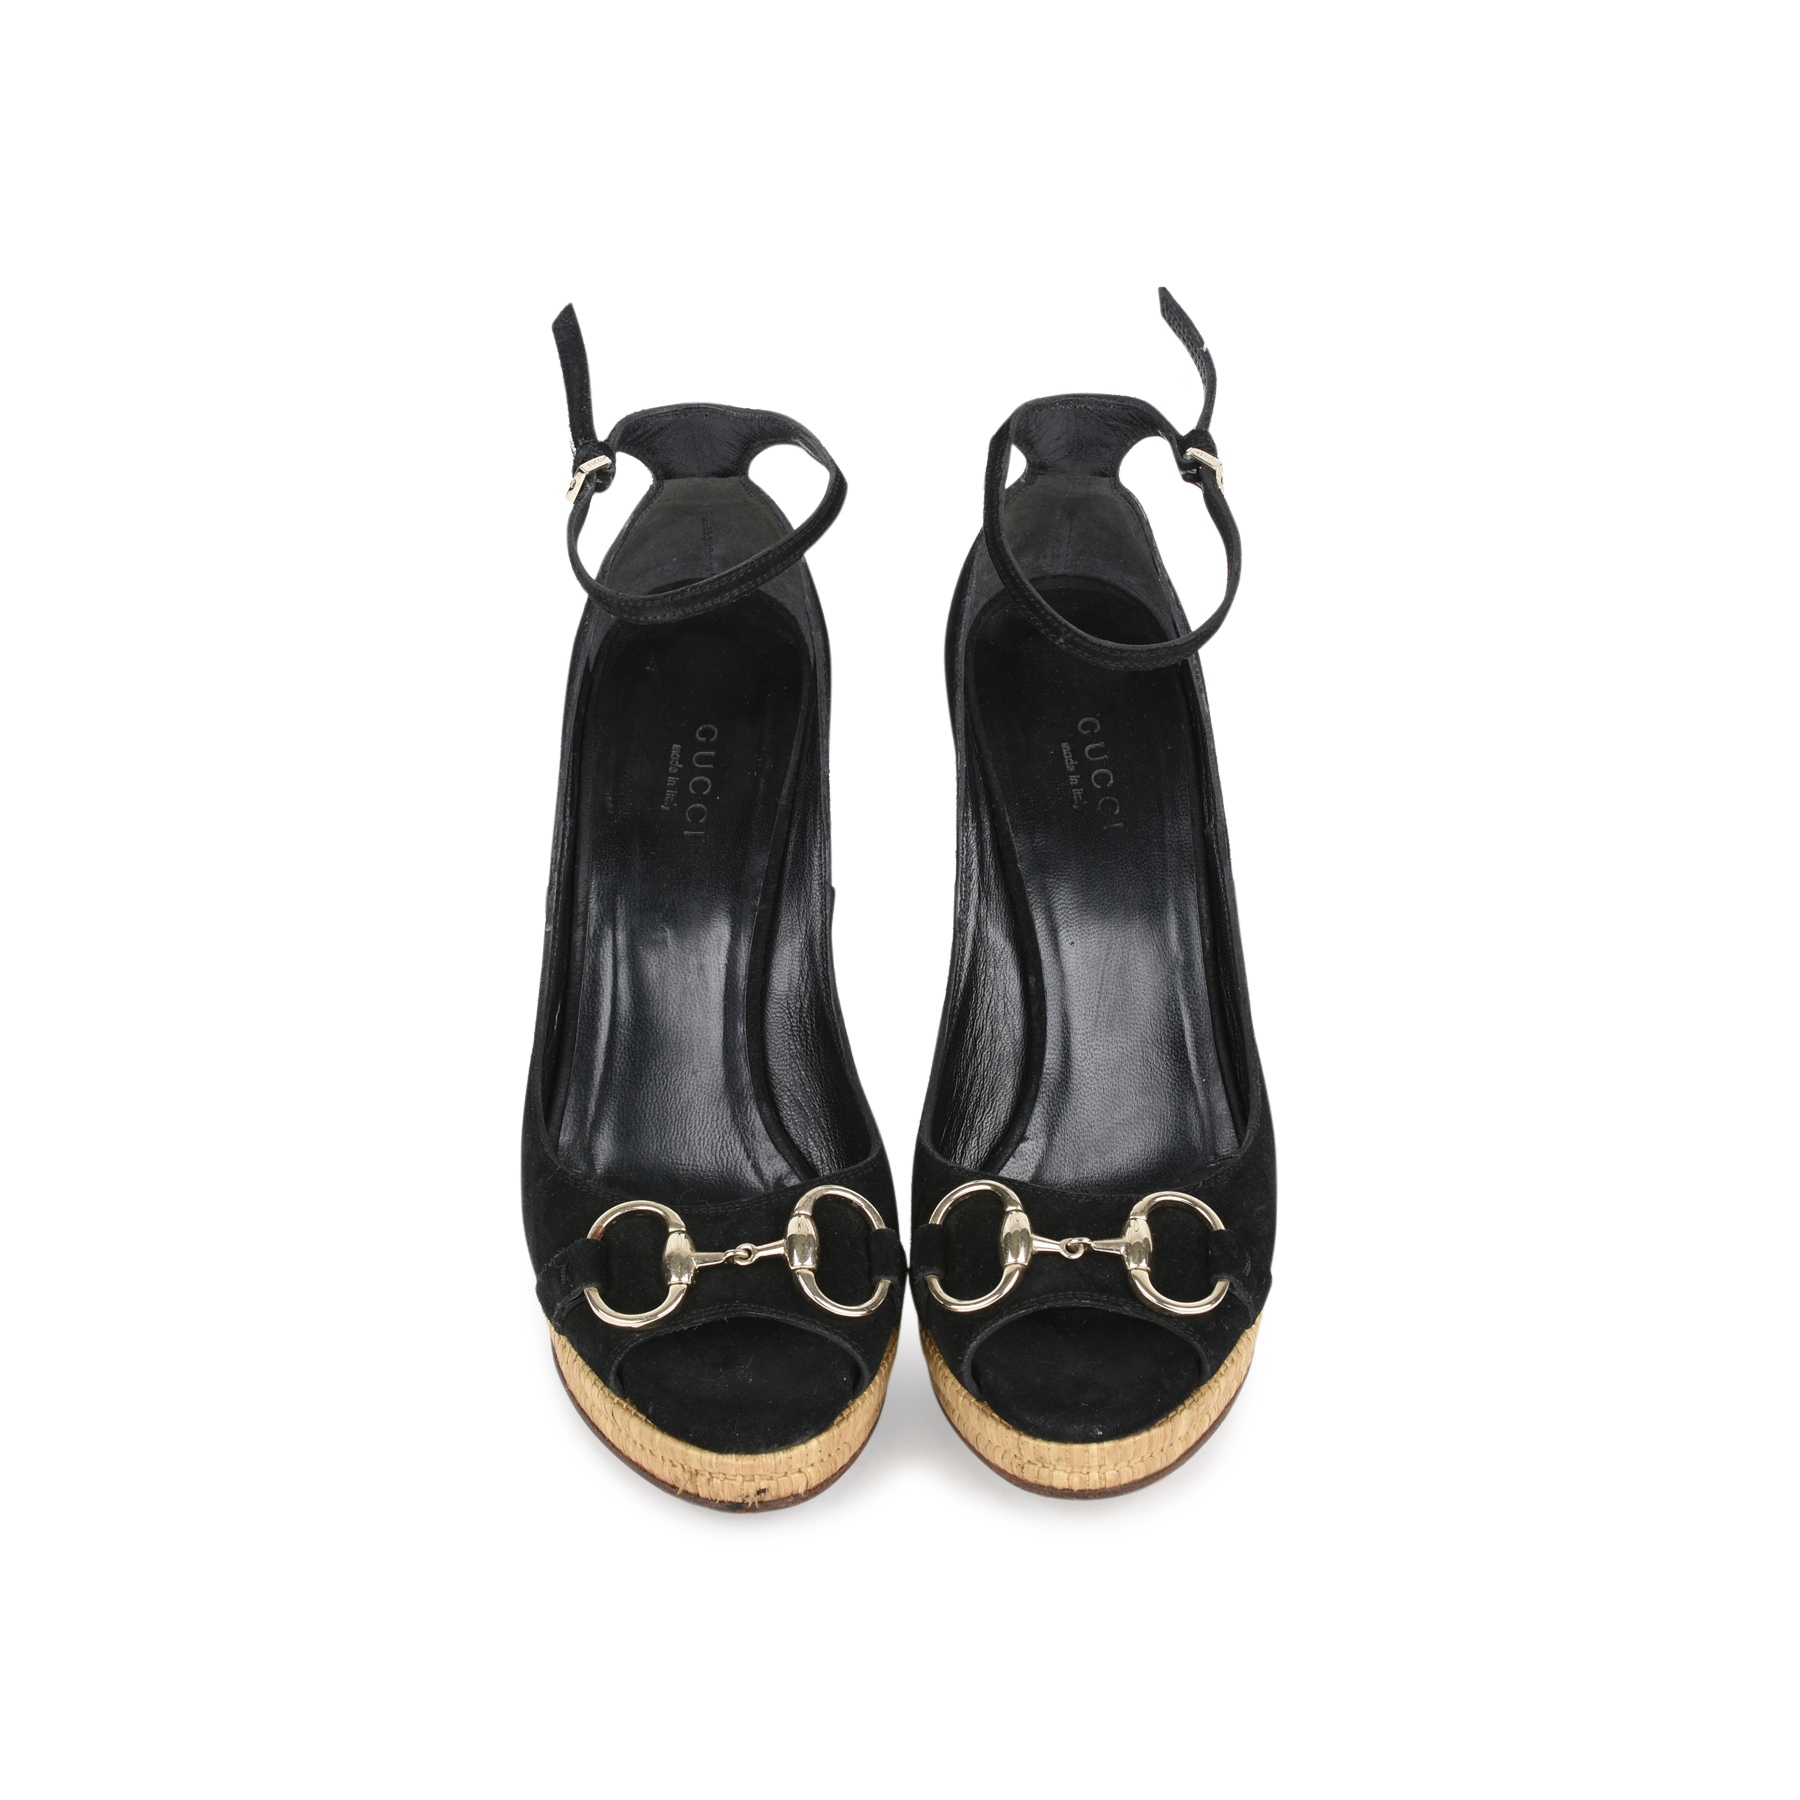 da7361ee285 Authentic Second Hand Gucci Suede Horsebit Peep-Toe Wedges (PSS-200-01151)